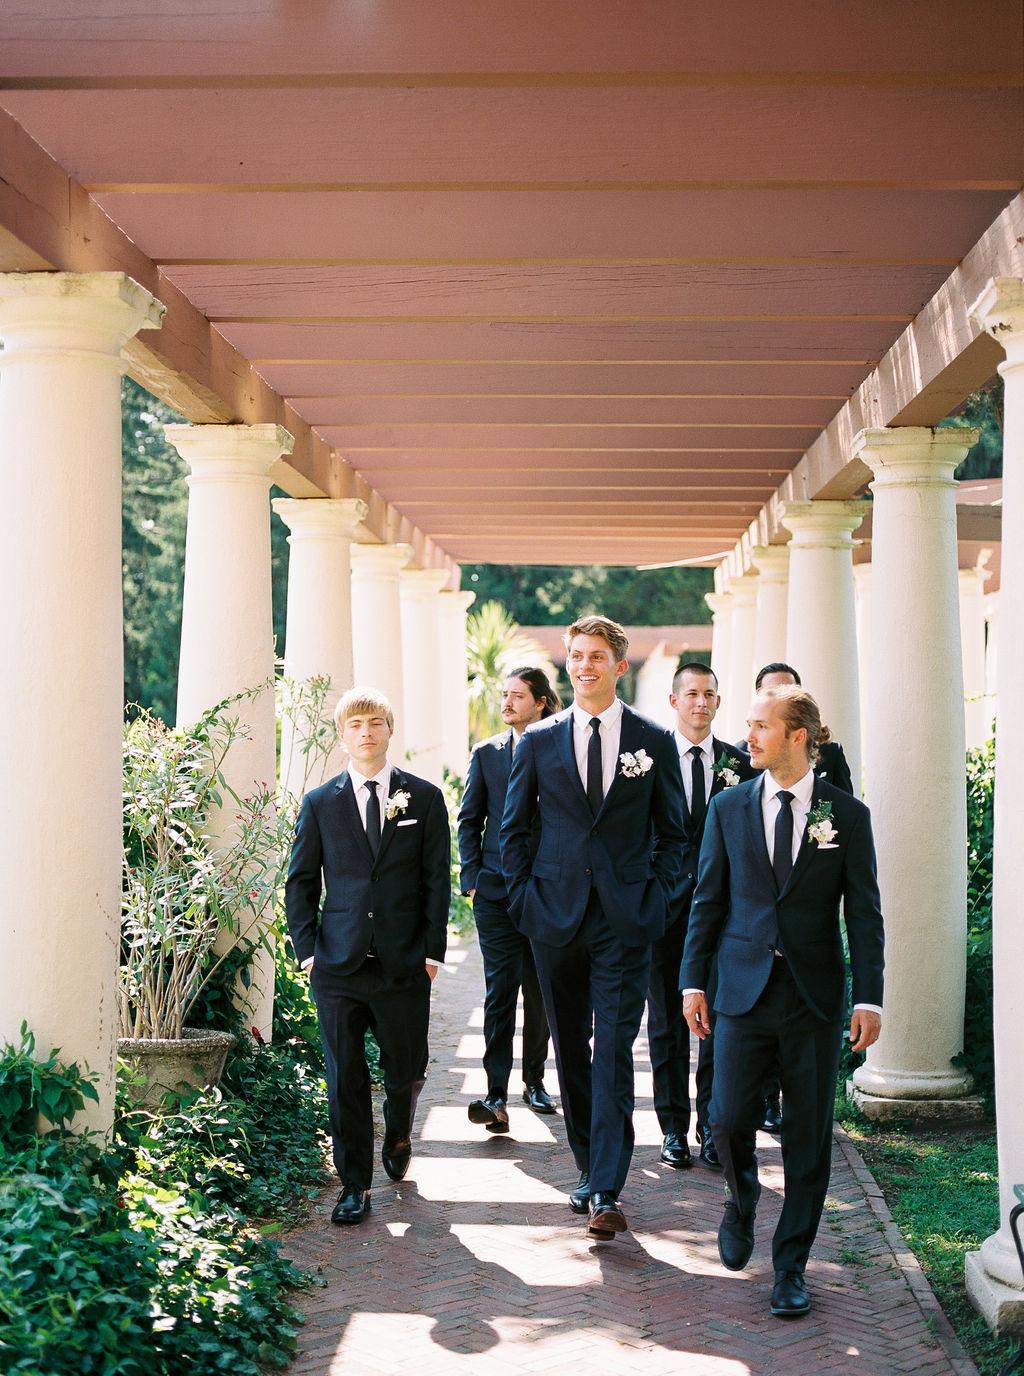 Alexandra-Elise-Photography-Film-Wedding-Photographer-Sonnenberg-Gardens-Finger-Lakes-Canandaigua-Highlights-013.jpg